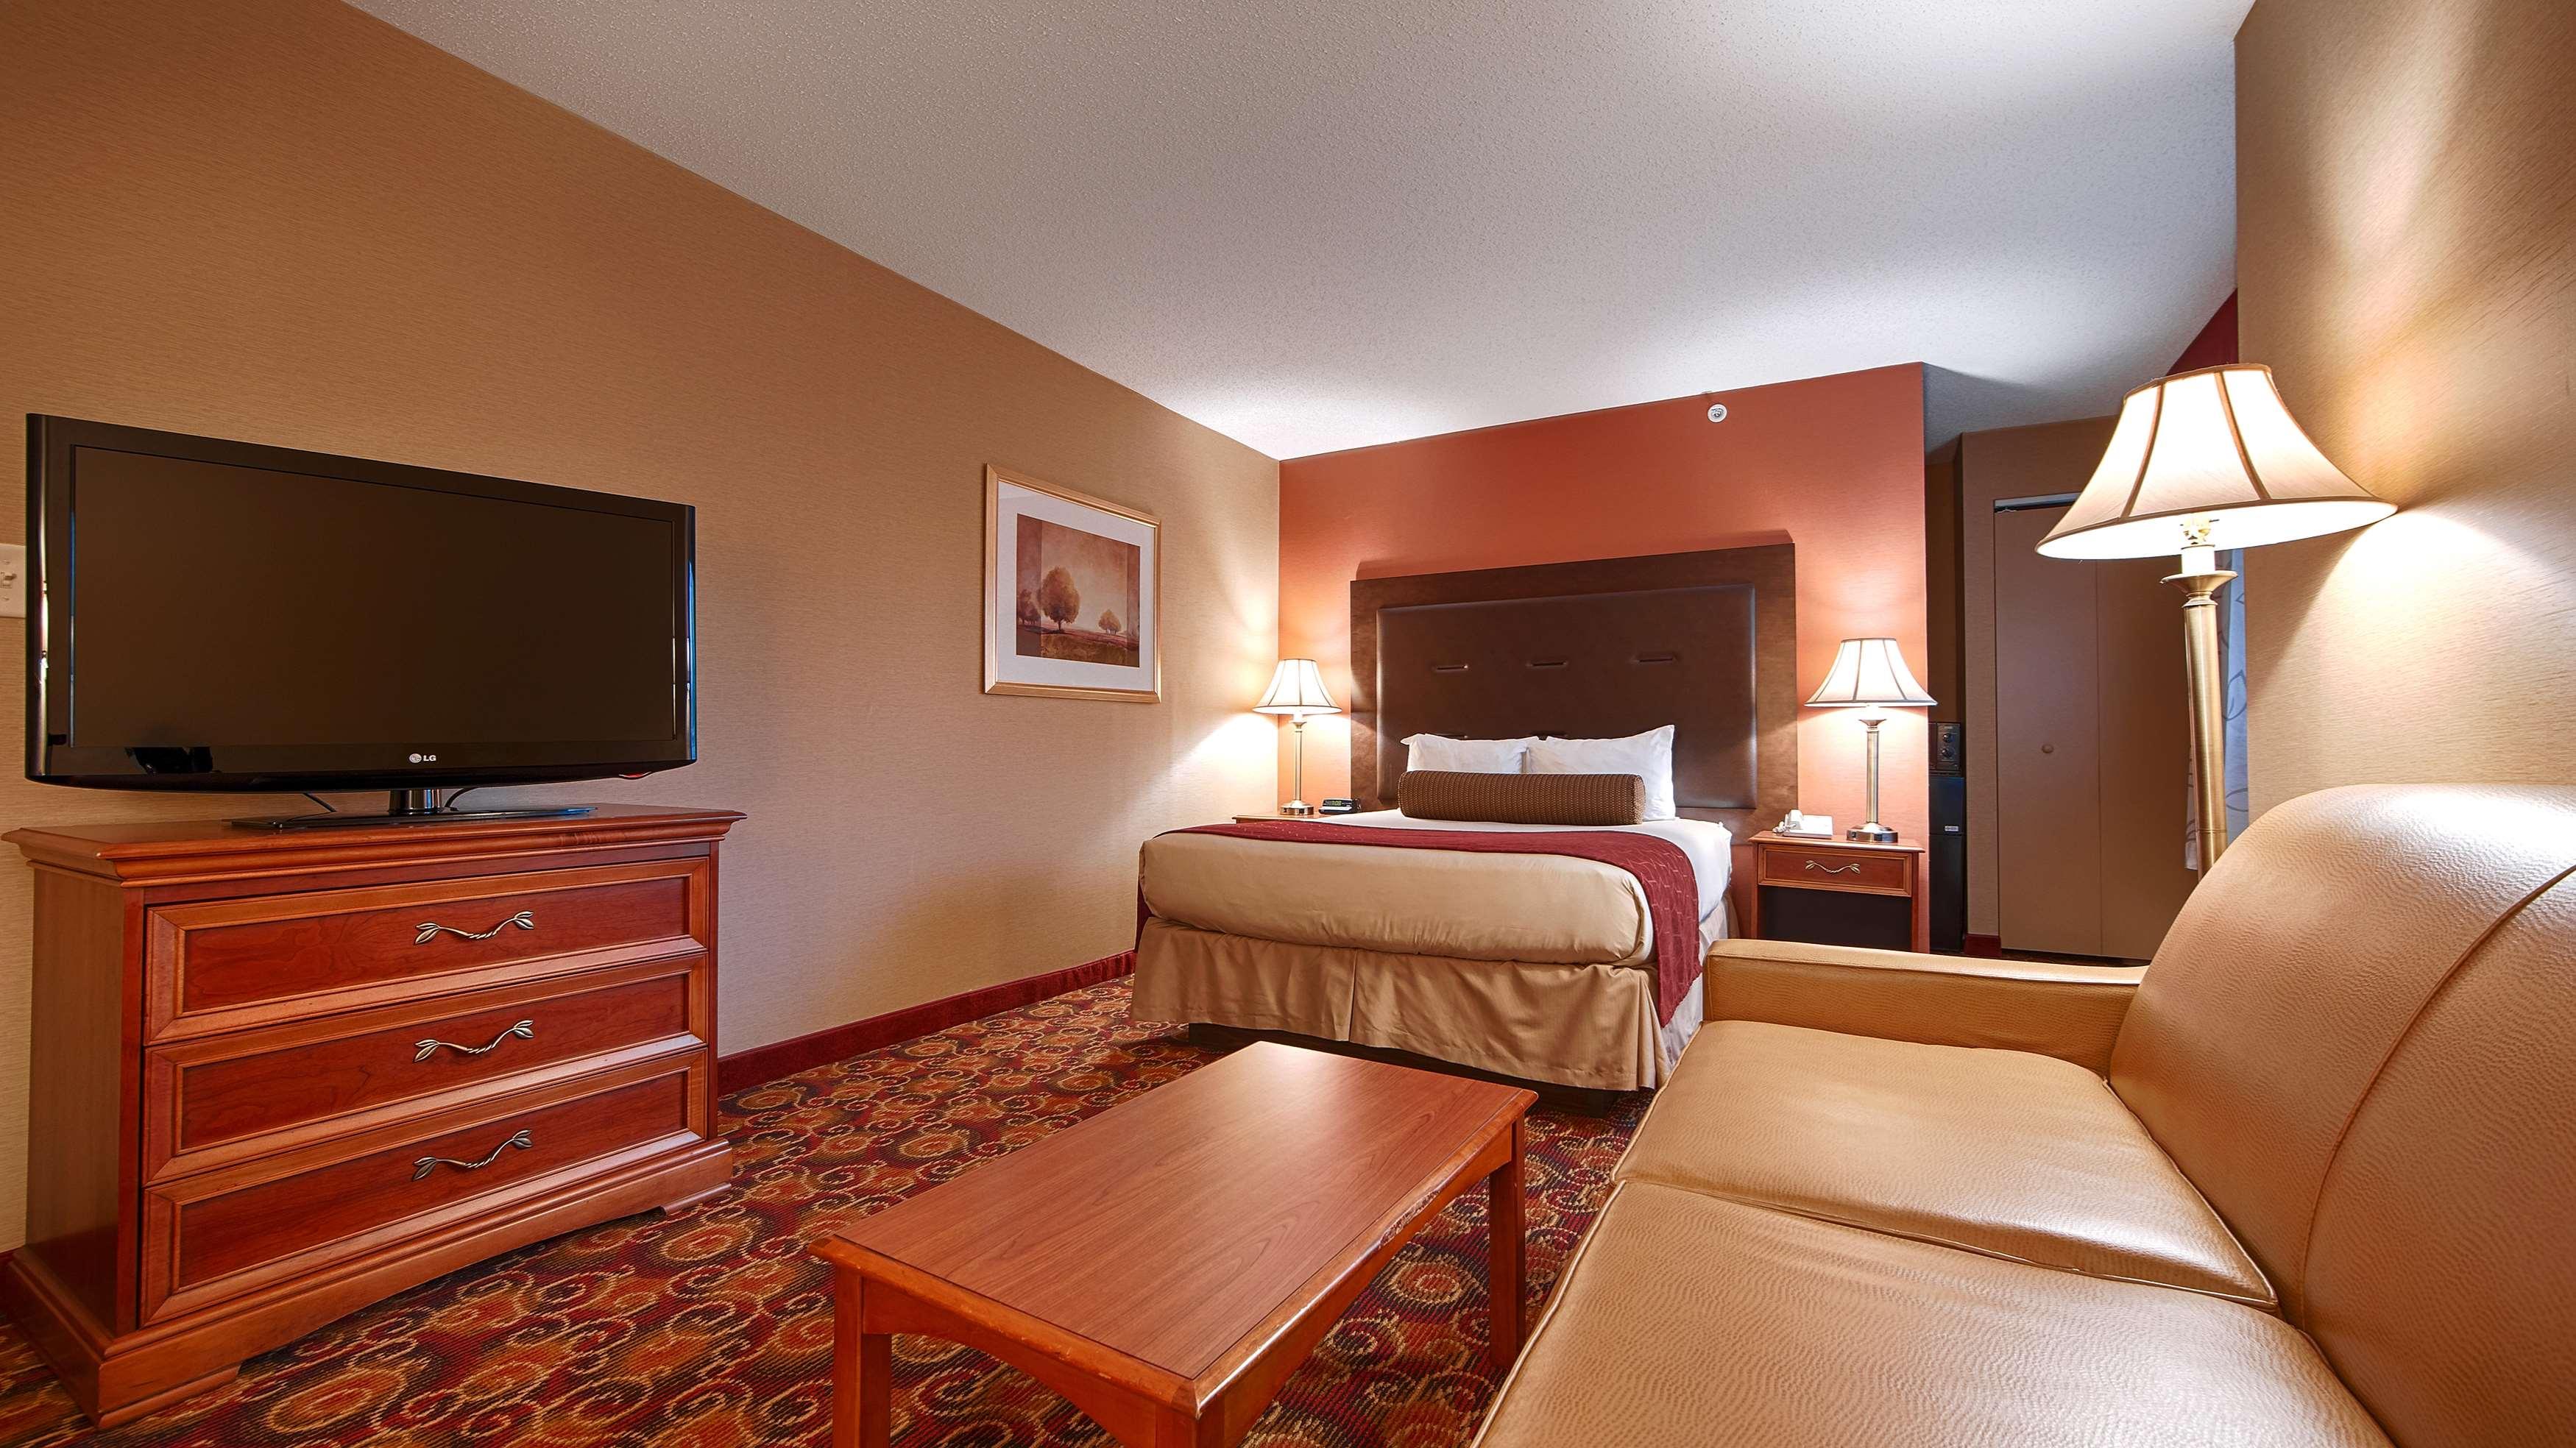 Best Western Plus The Inn at Sharon/Foxboro image 12